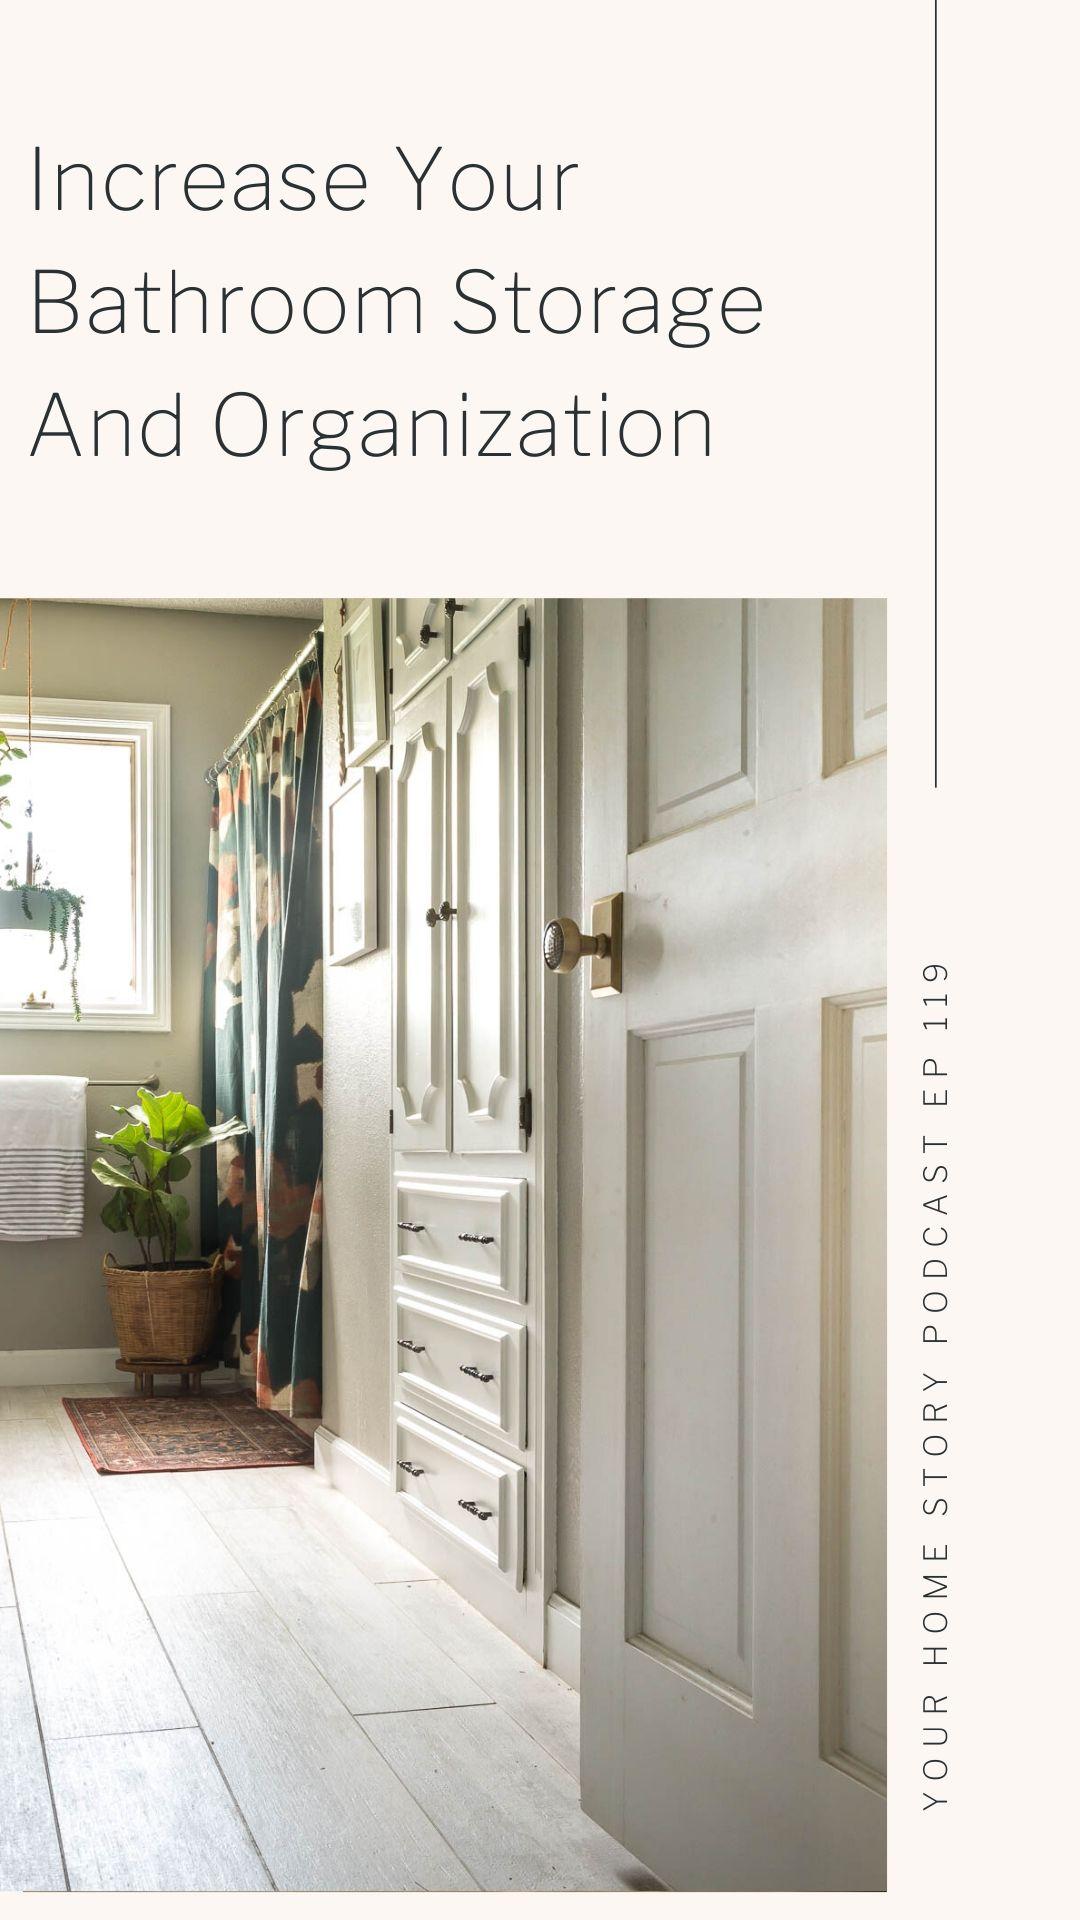 Increase Your Bathroom Storage and Organization